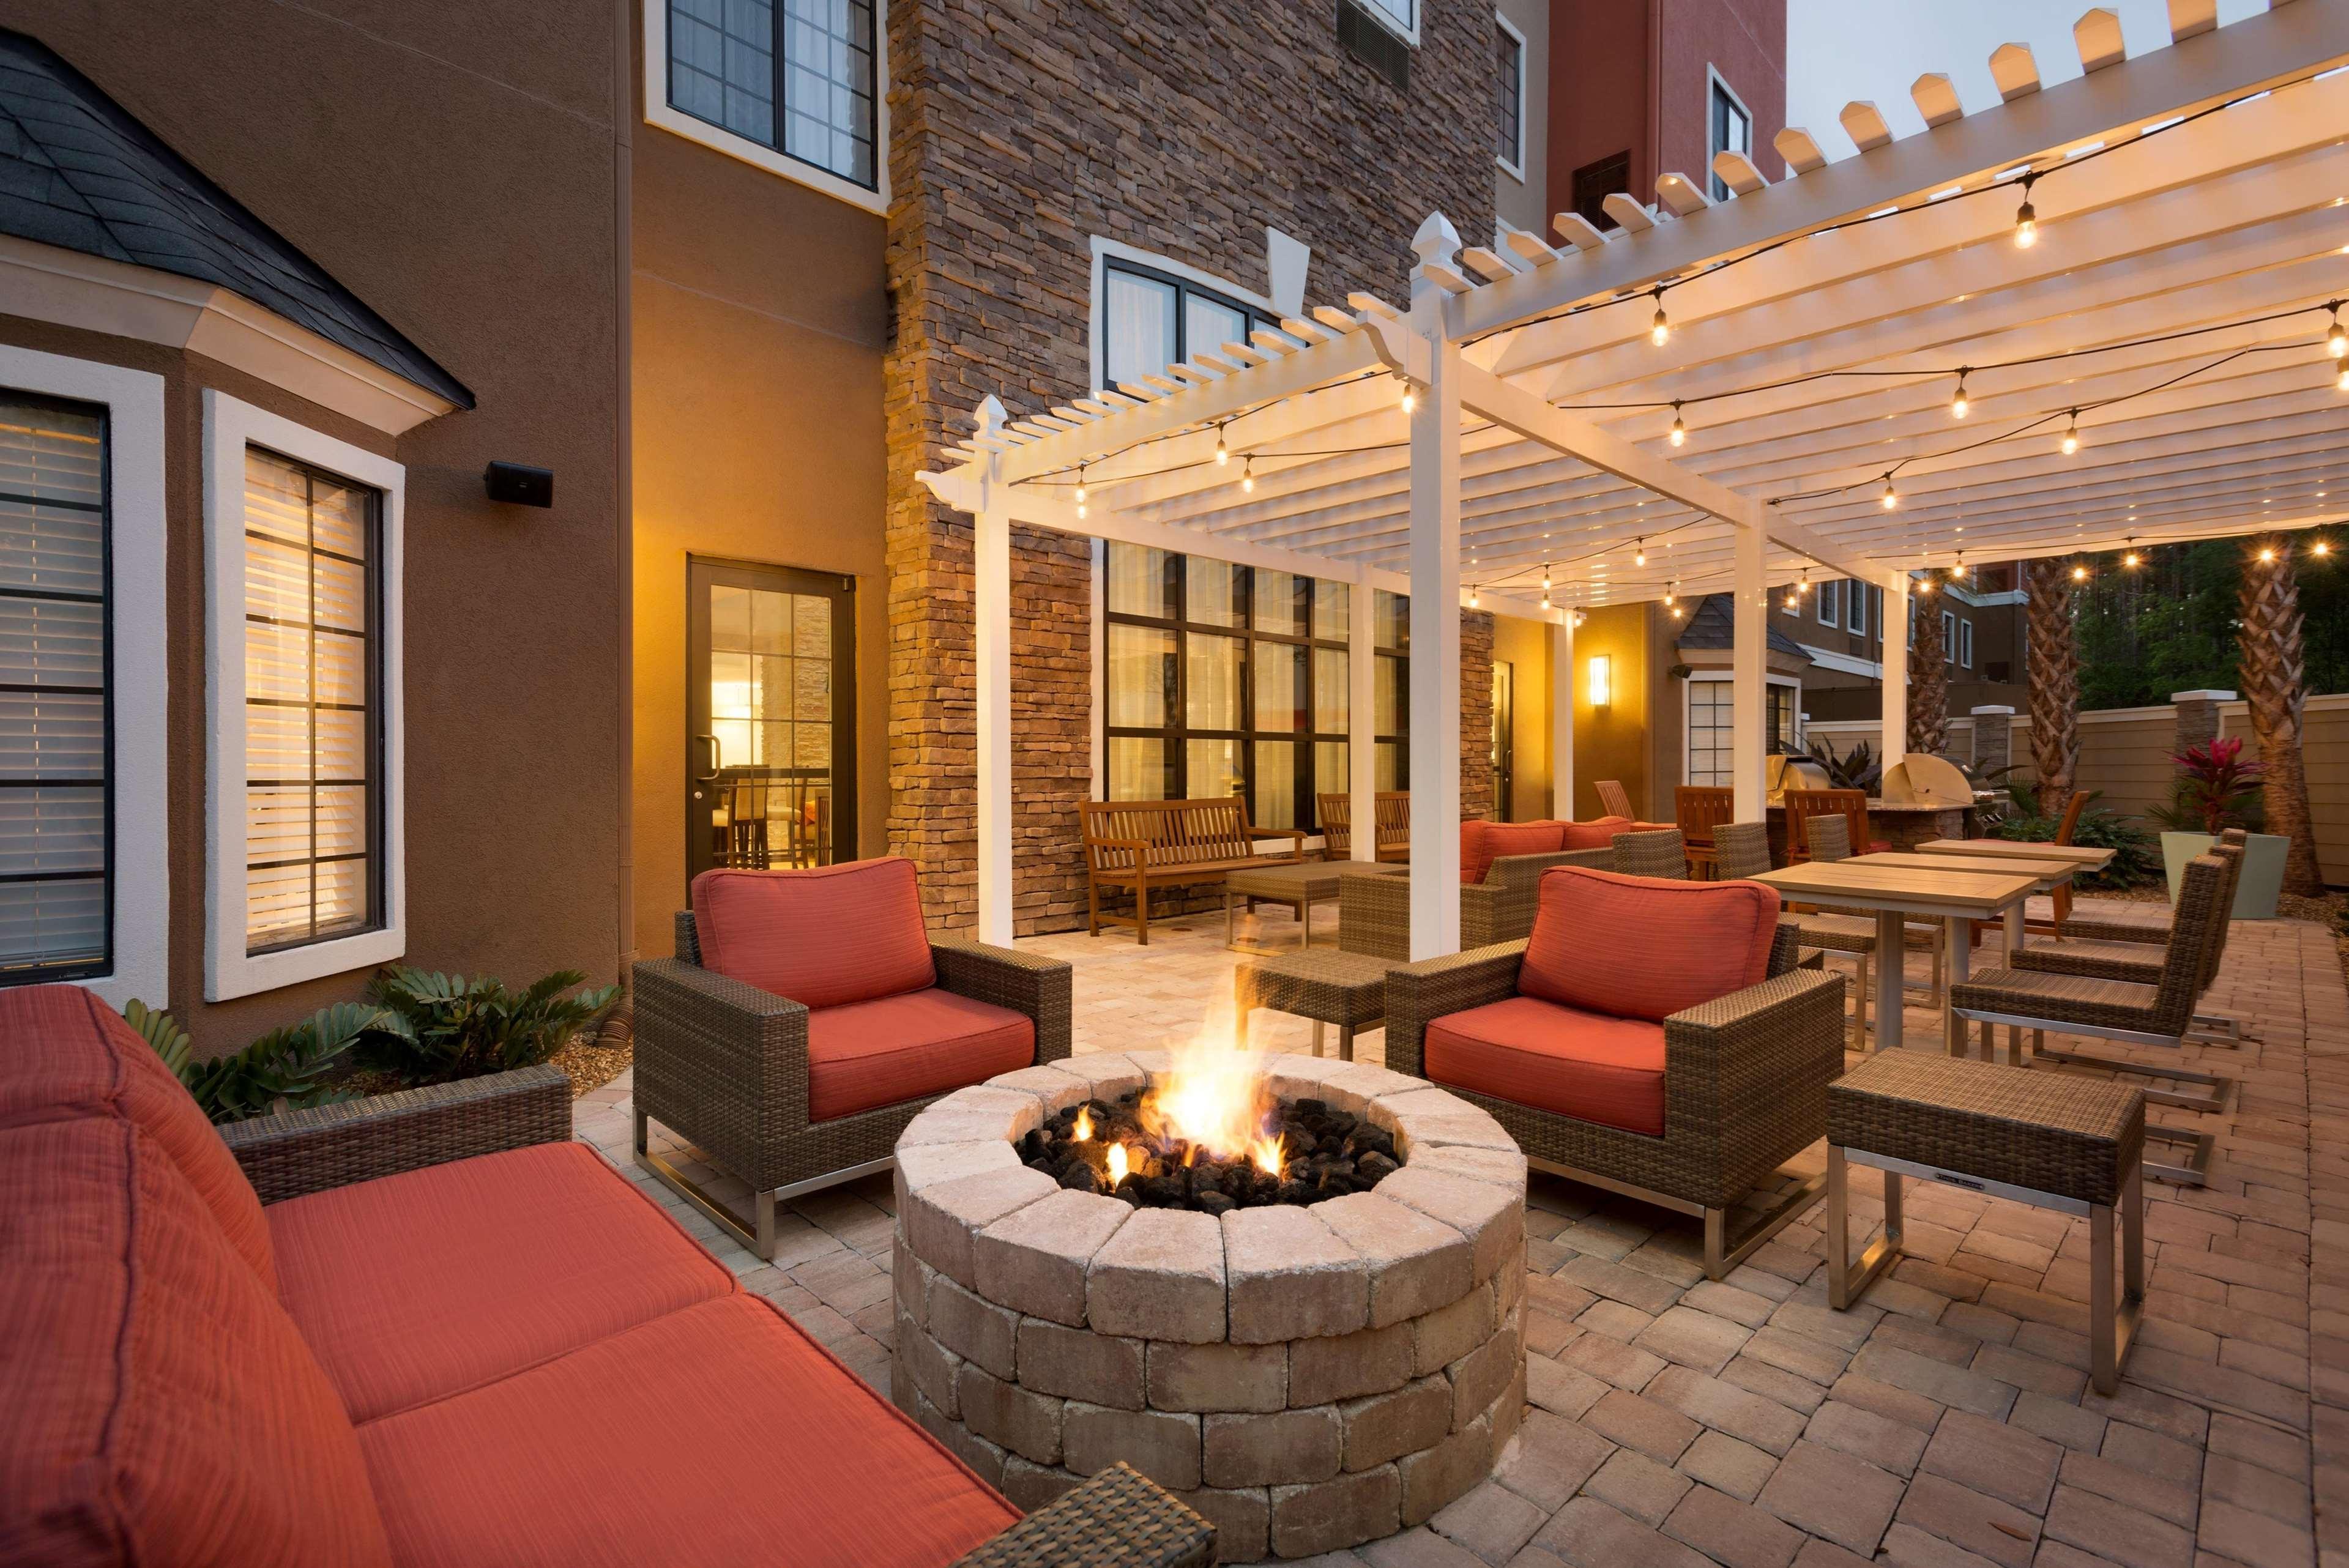 Homewood Suites Jacksonville Deerwood Park 8511 Touchton Road